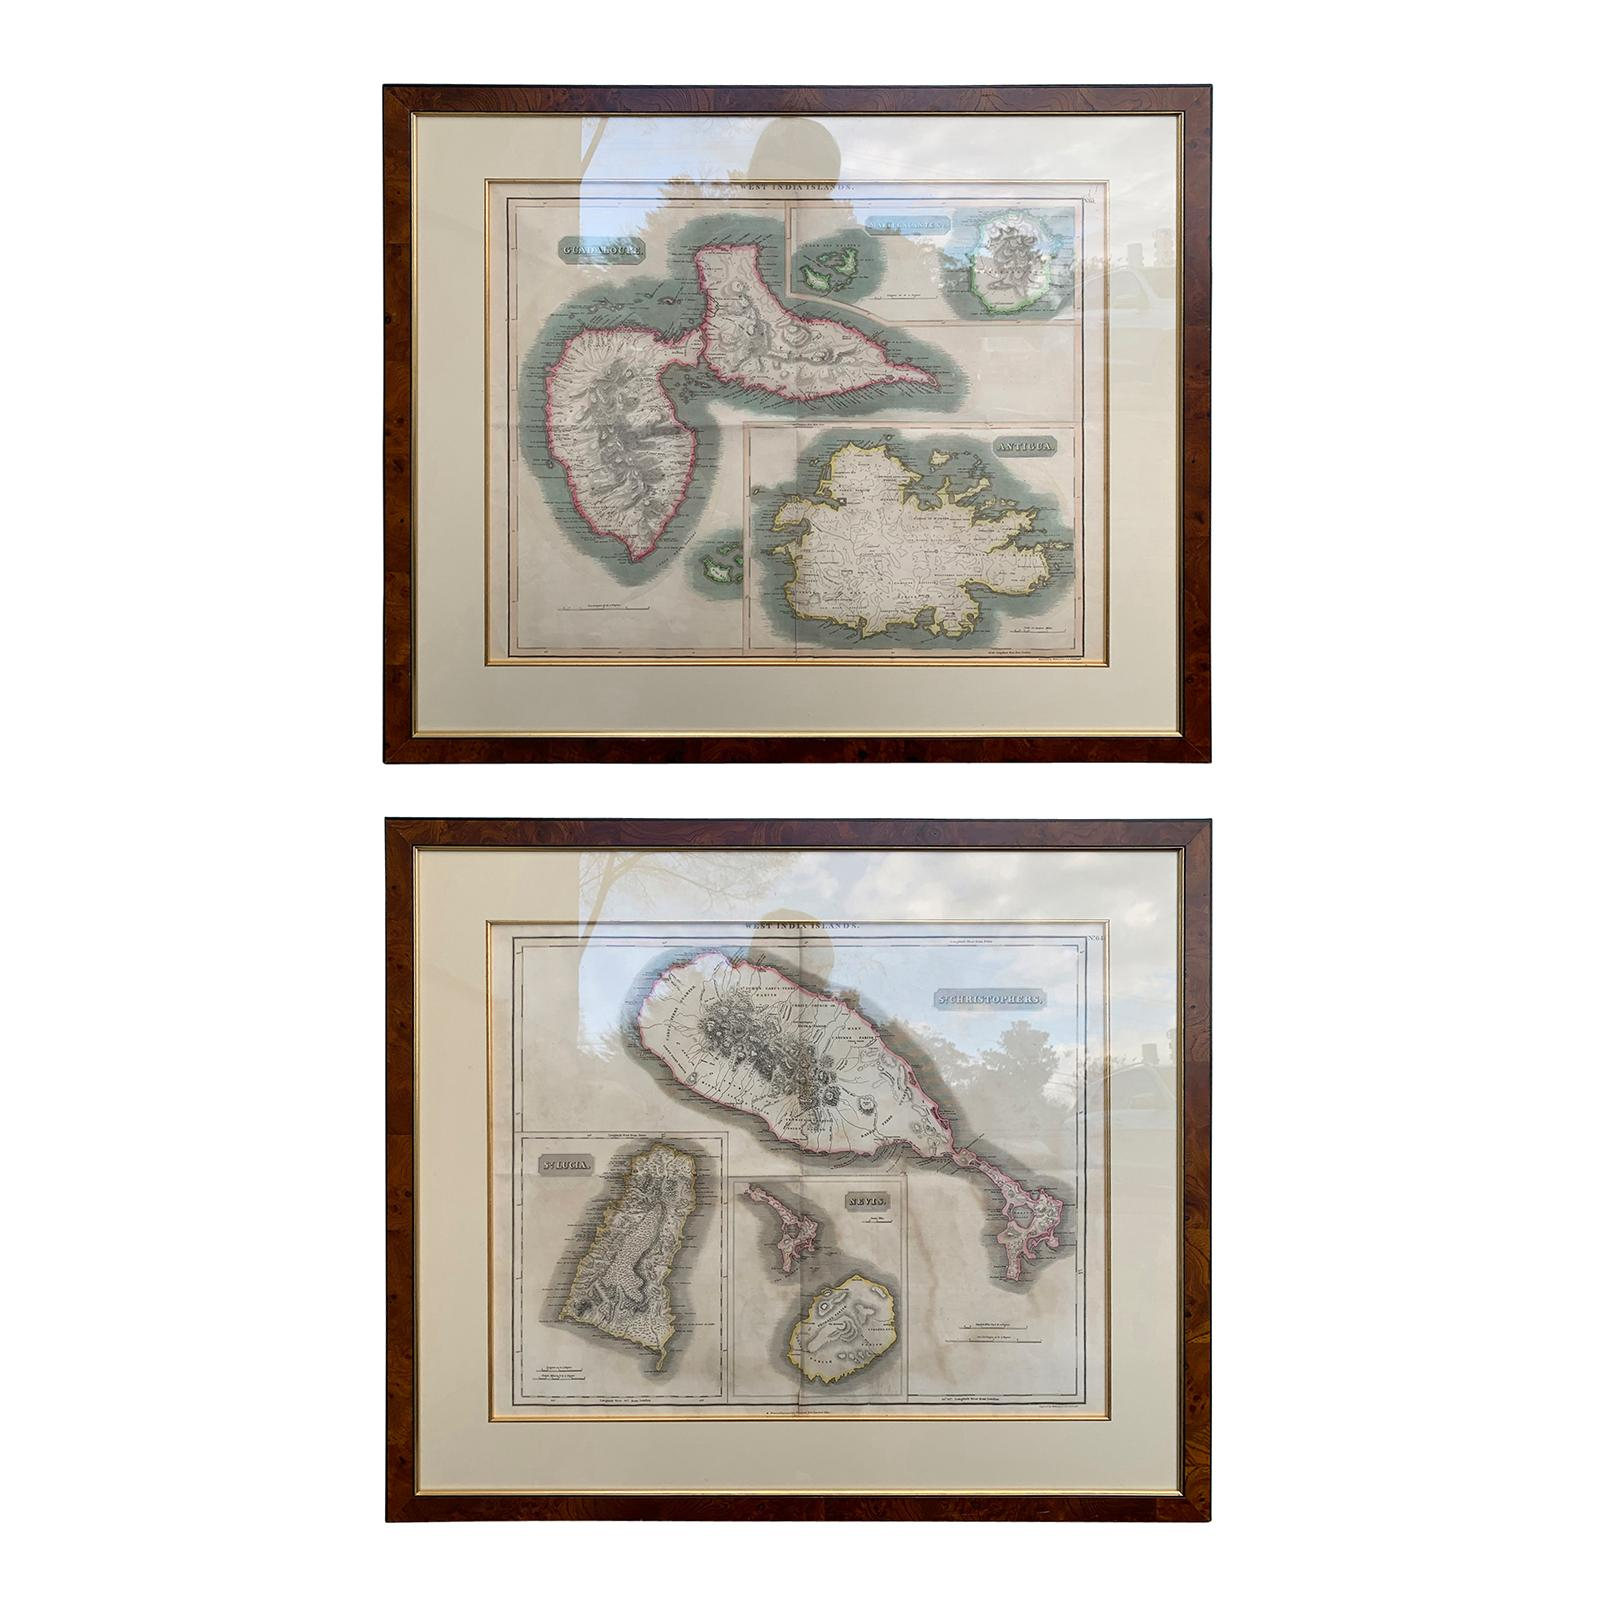 Pair of Engraved Maps by Kirkwood & Son of Edinburgh of West India Islands